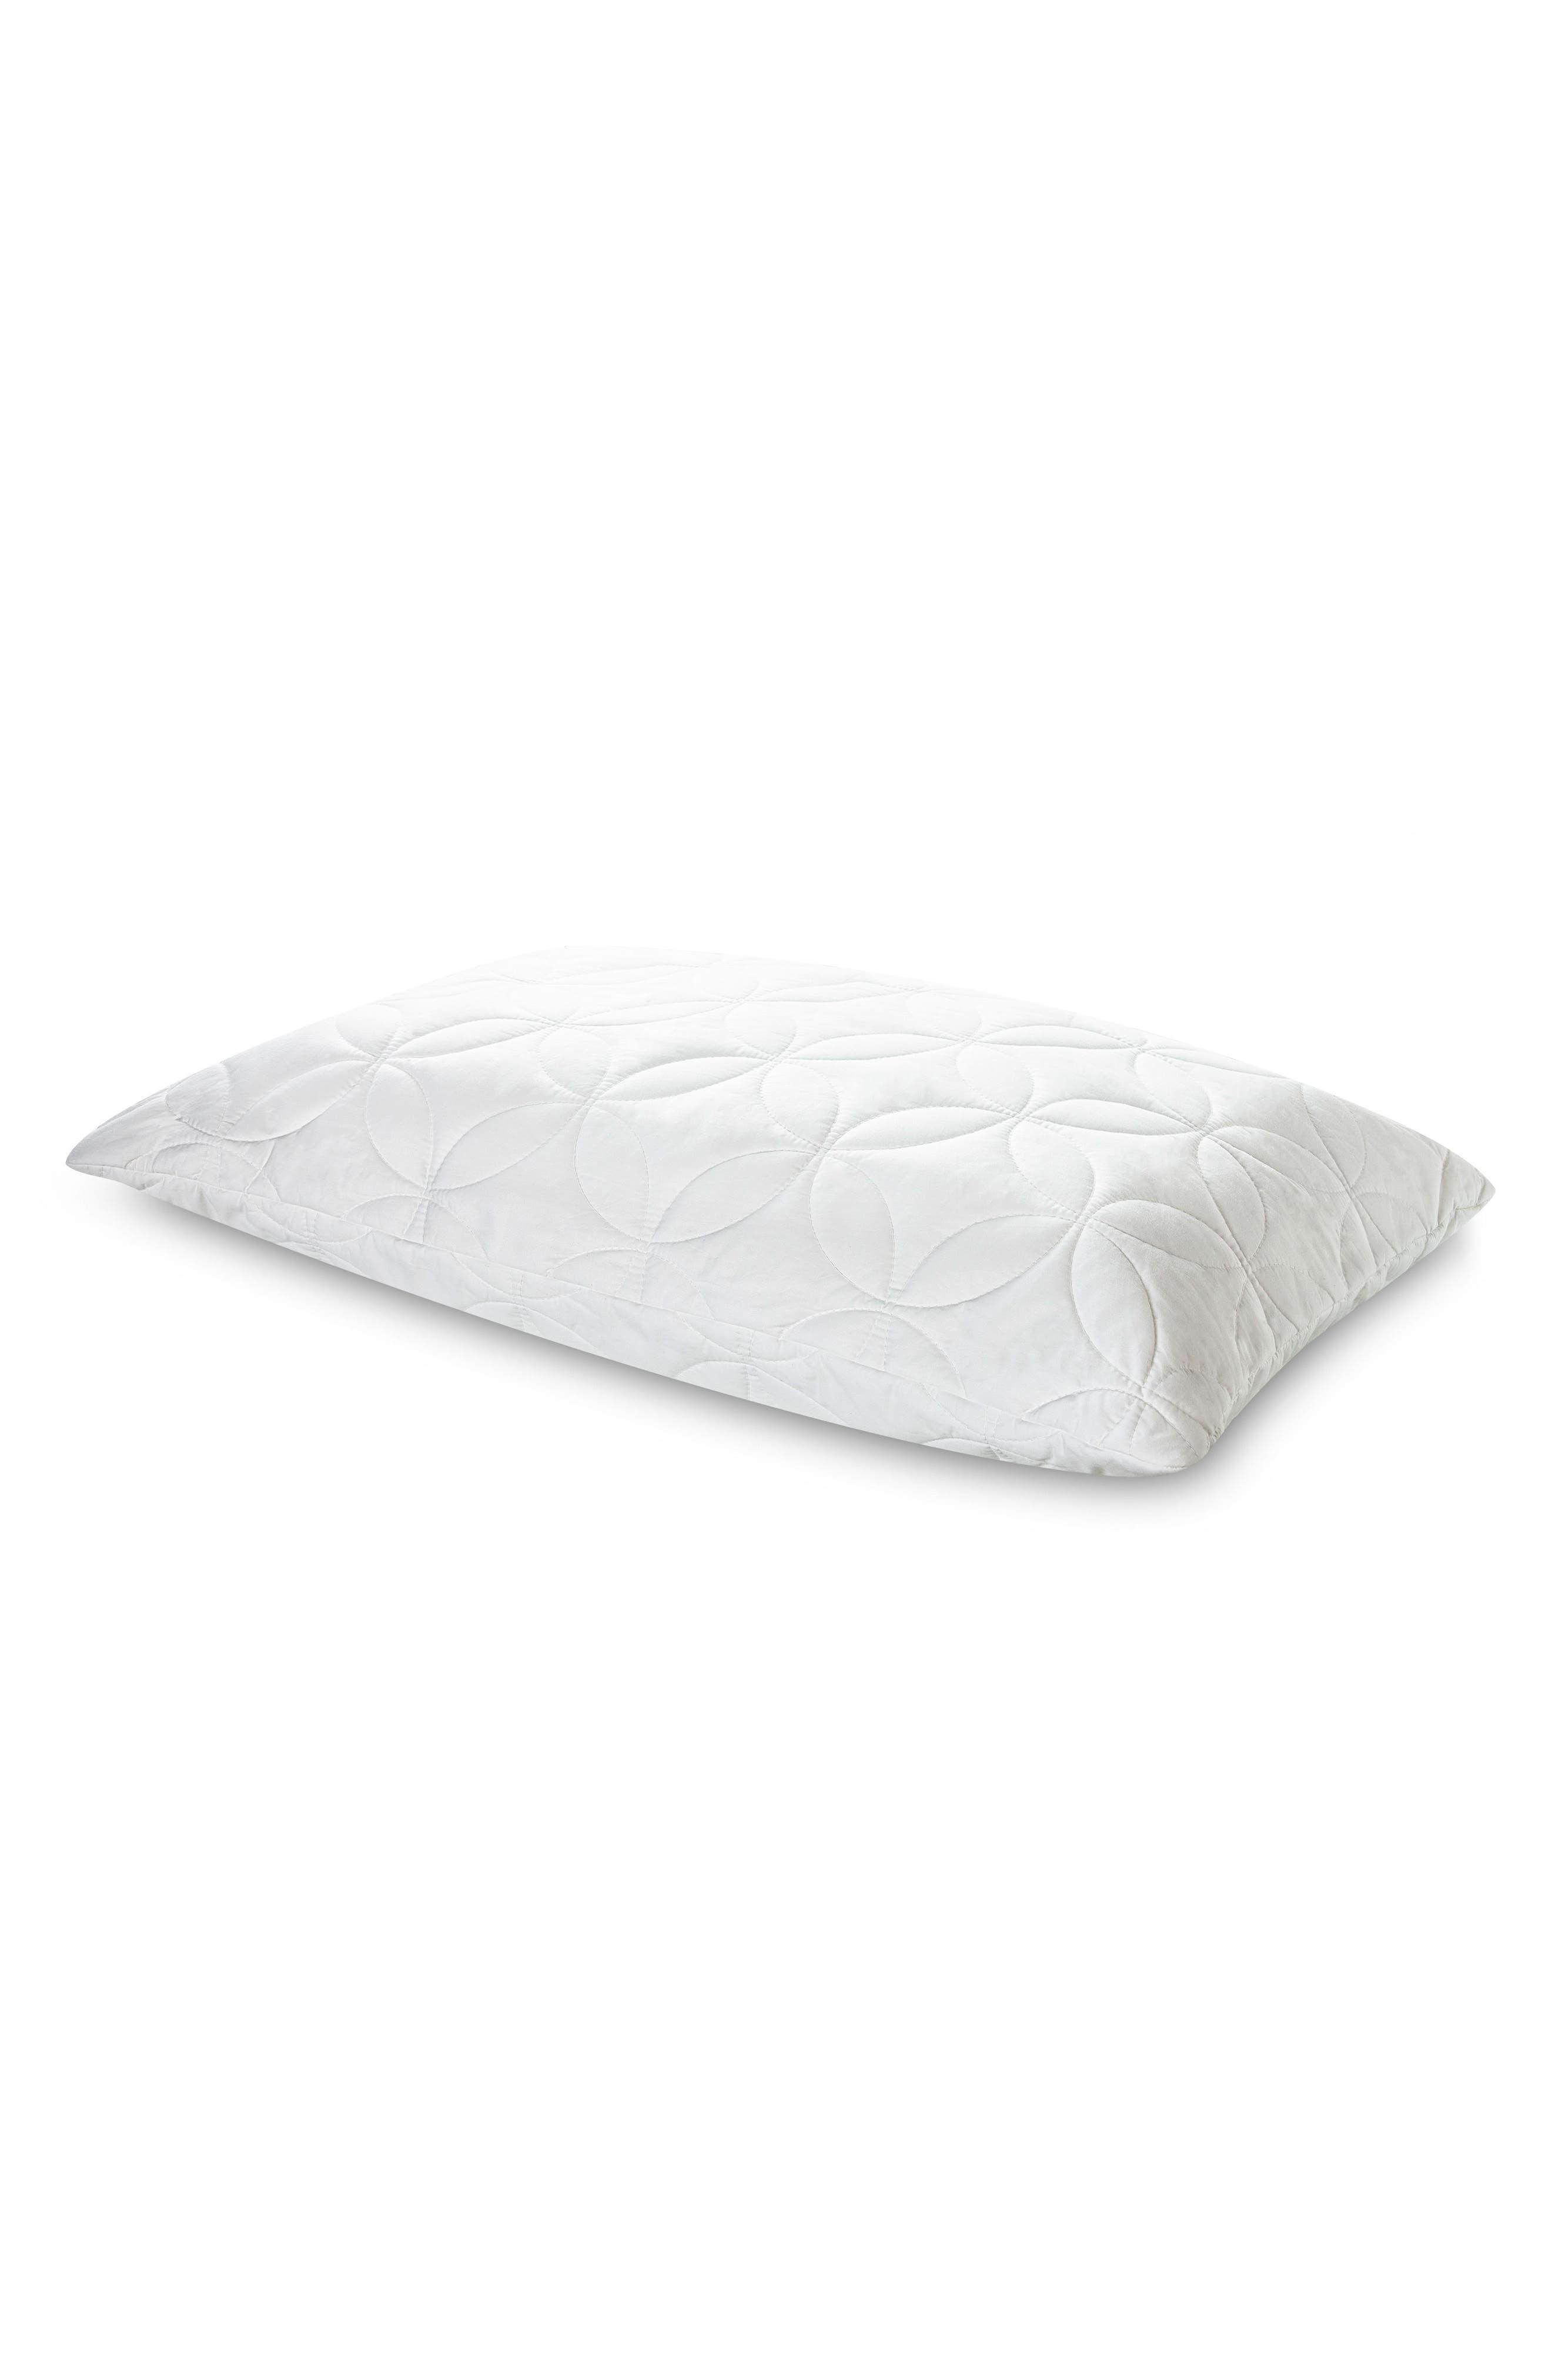 Main Image - Tempur-Pedic TEMPUR-Cloud Soft & Conforming Queen Pillow